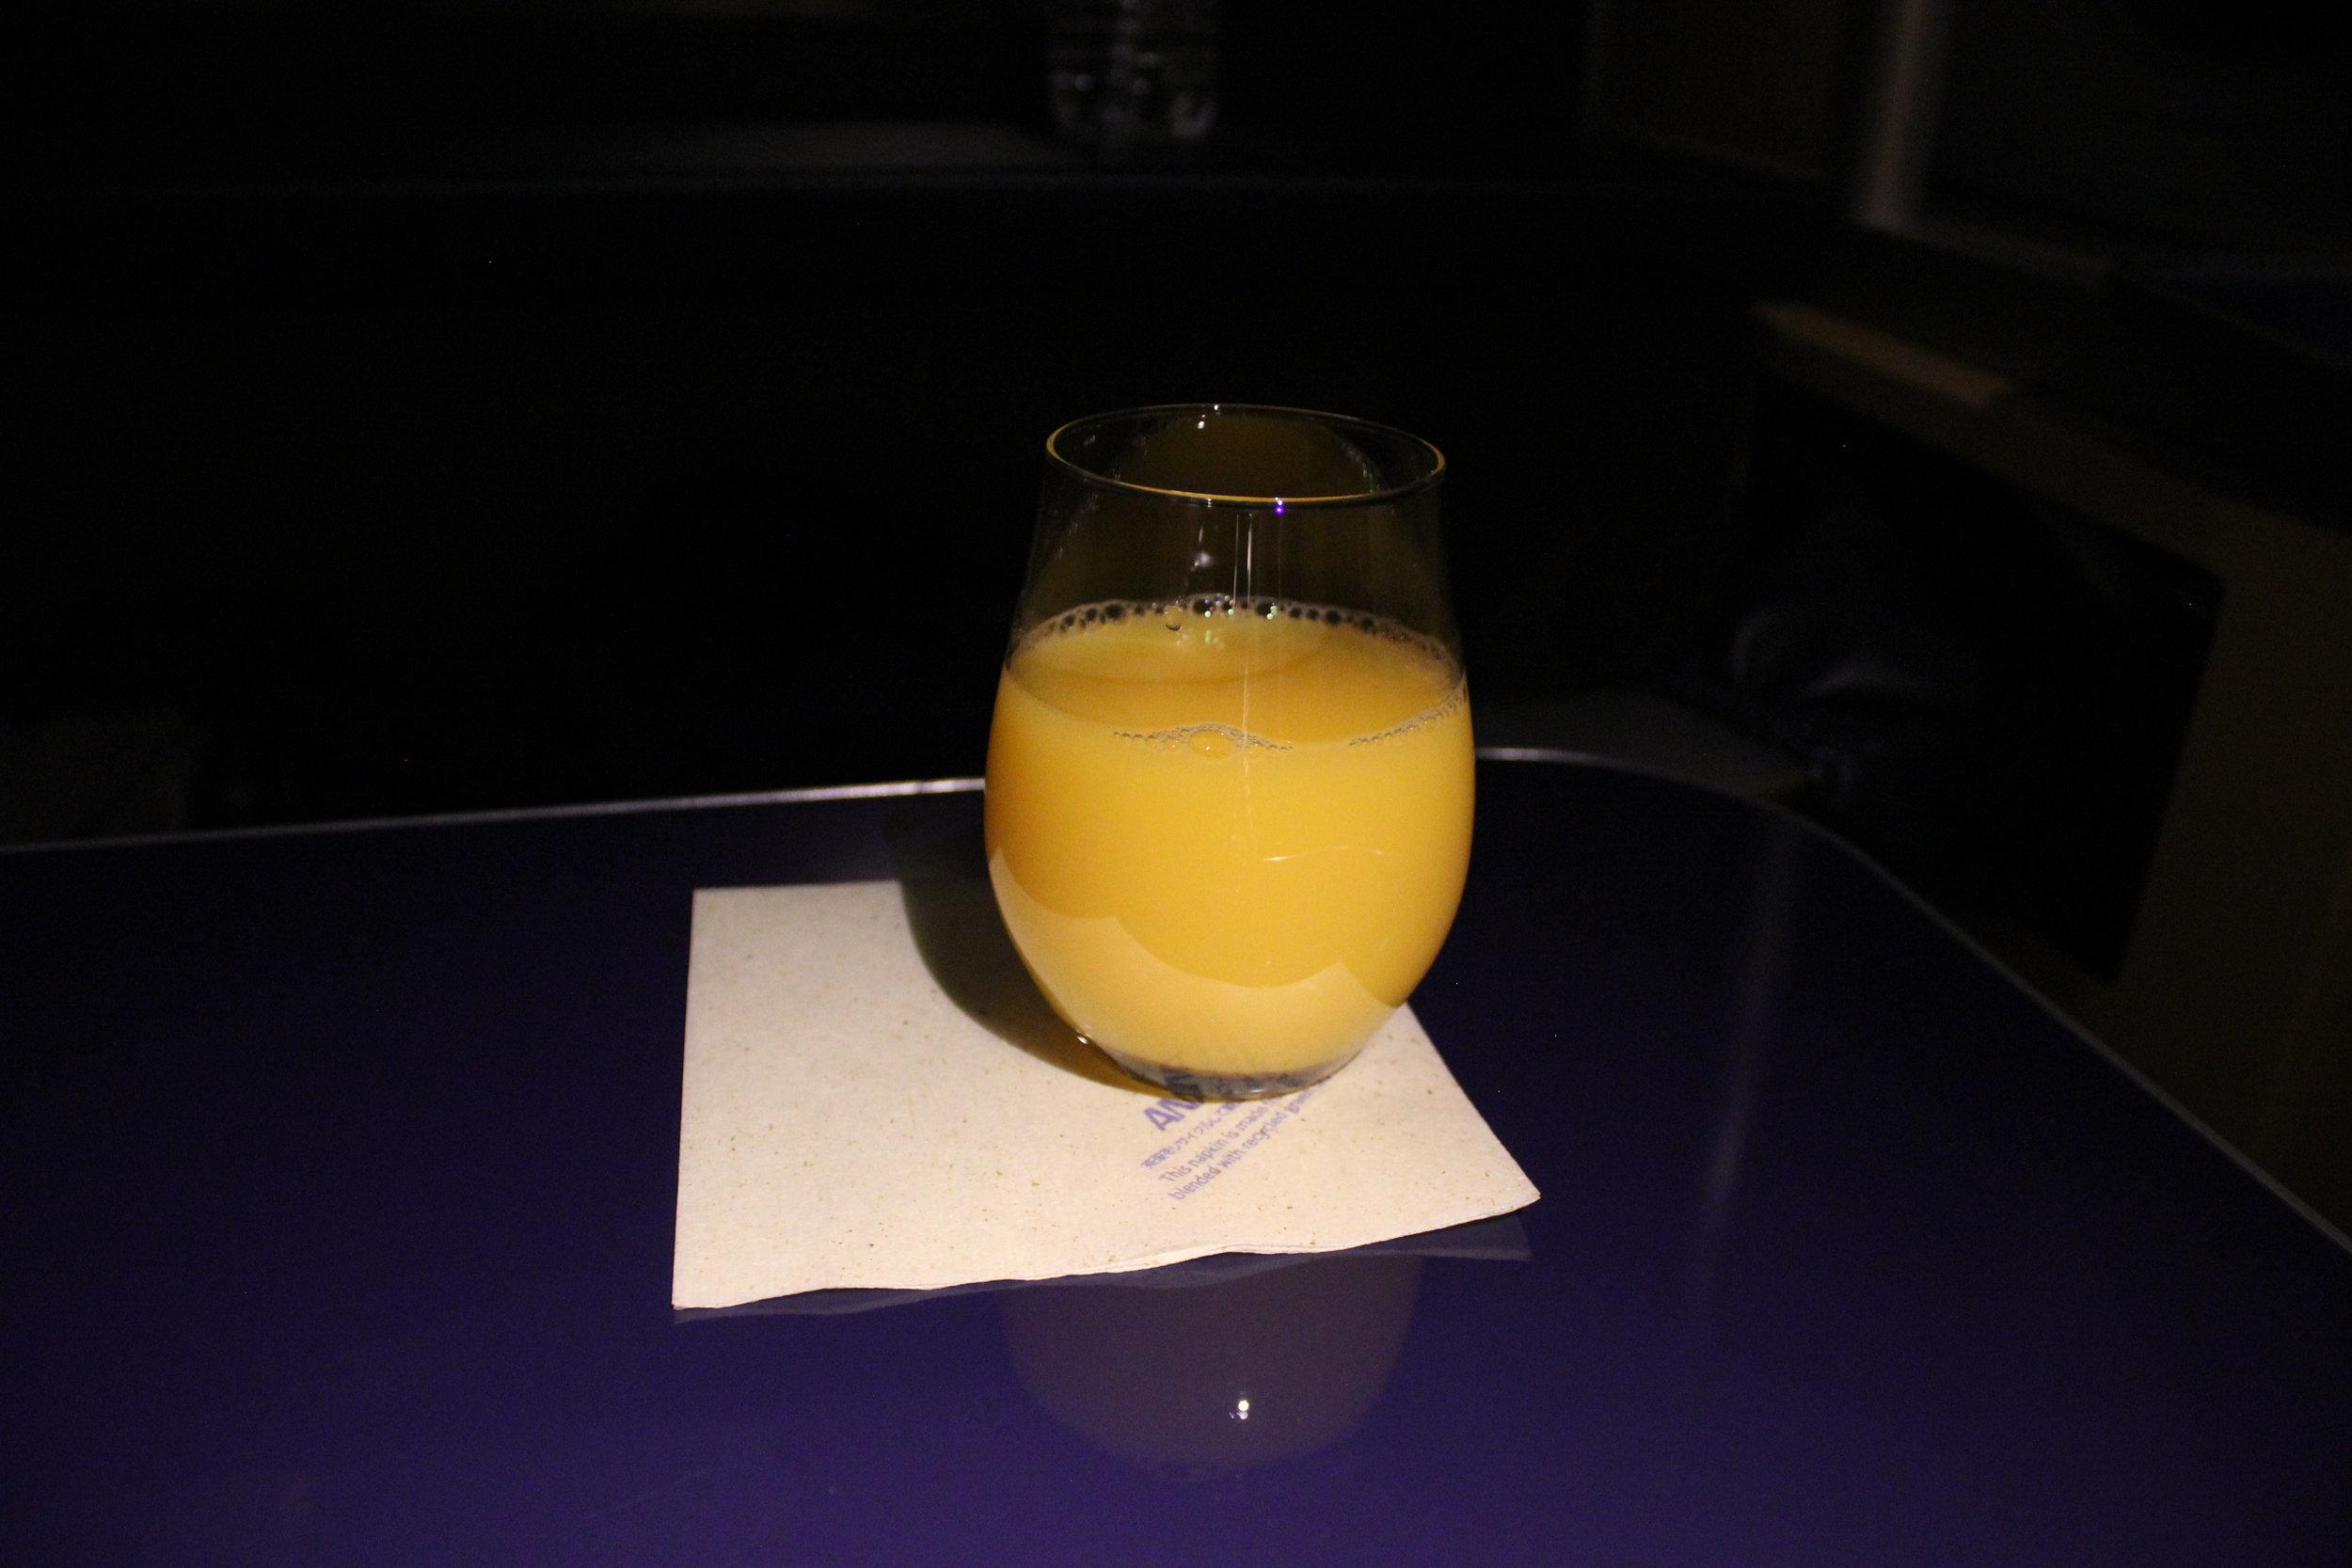 ANA First Class – Orange juice